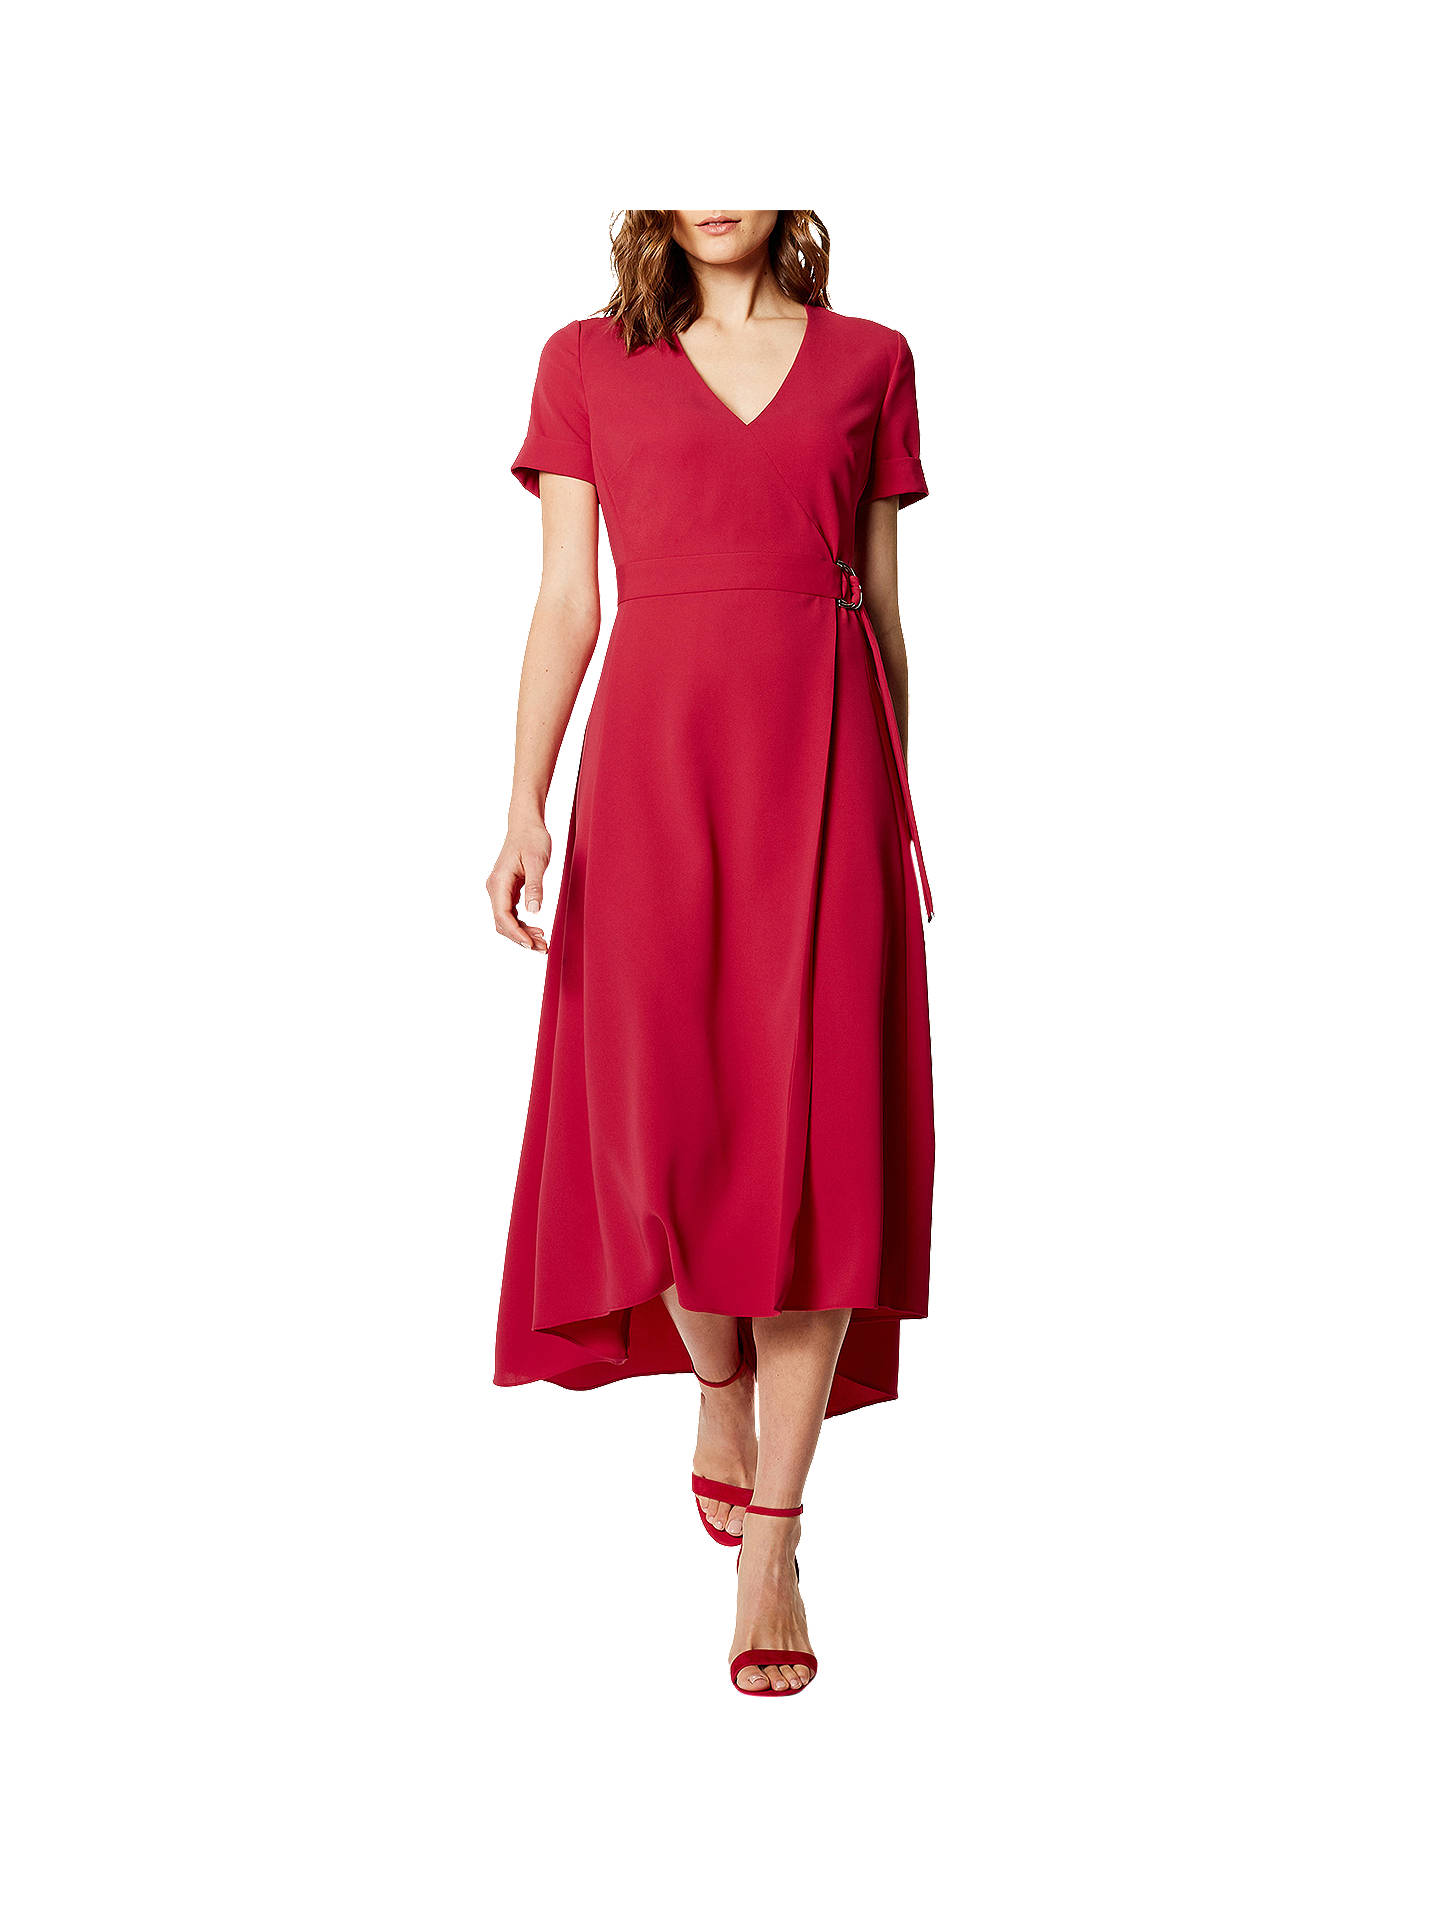 New KAREN MILLEN Oriental BNWT £210 Embroidery Corset Evening Party Dress SALE